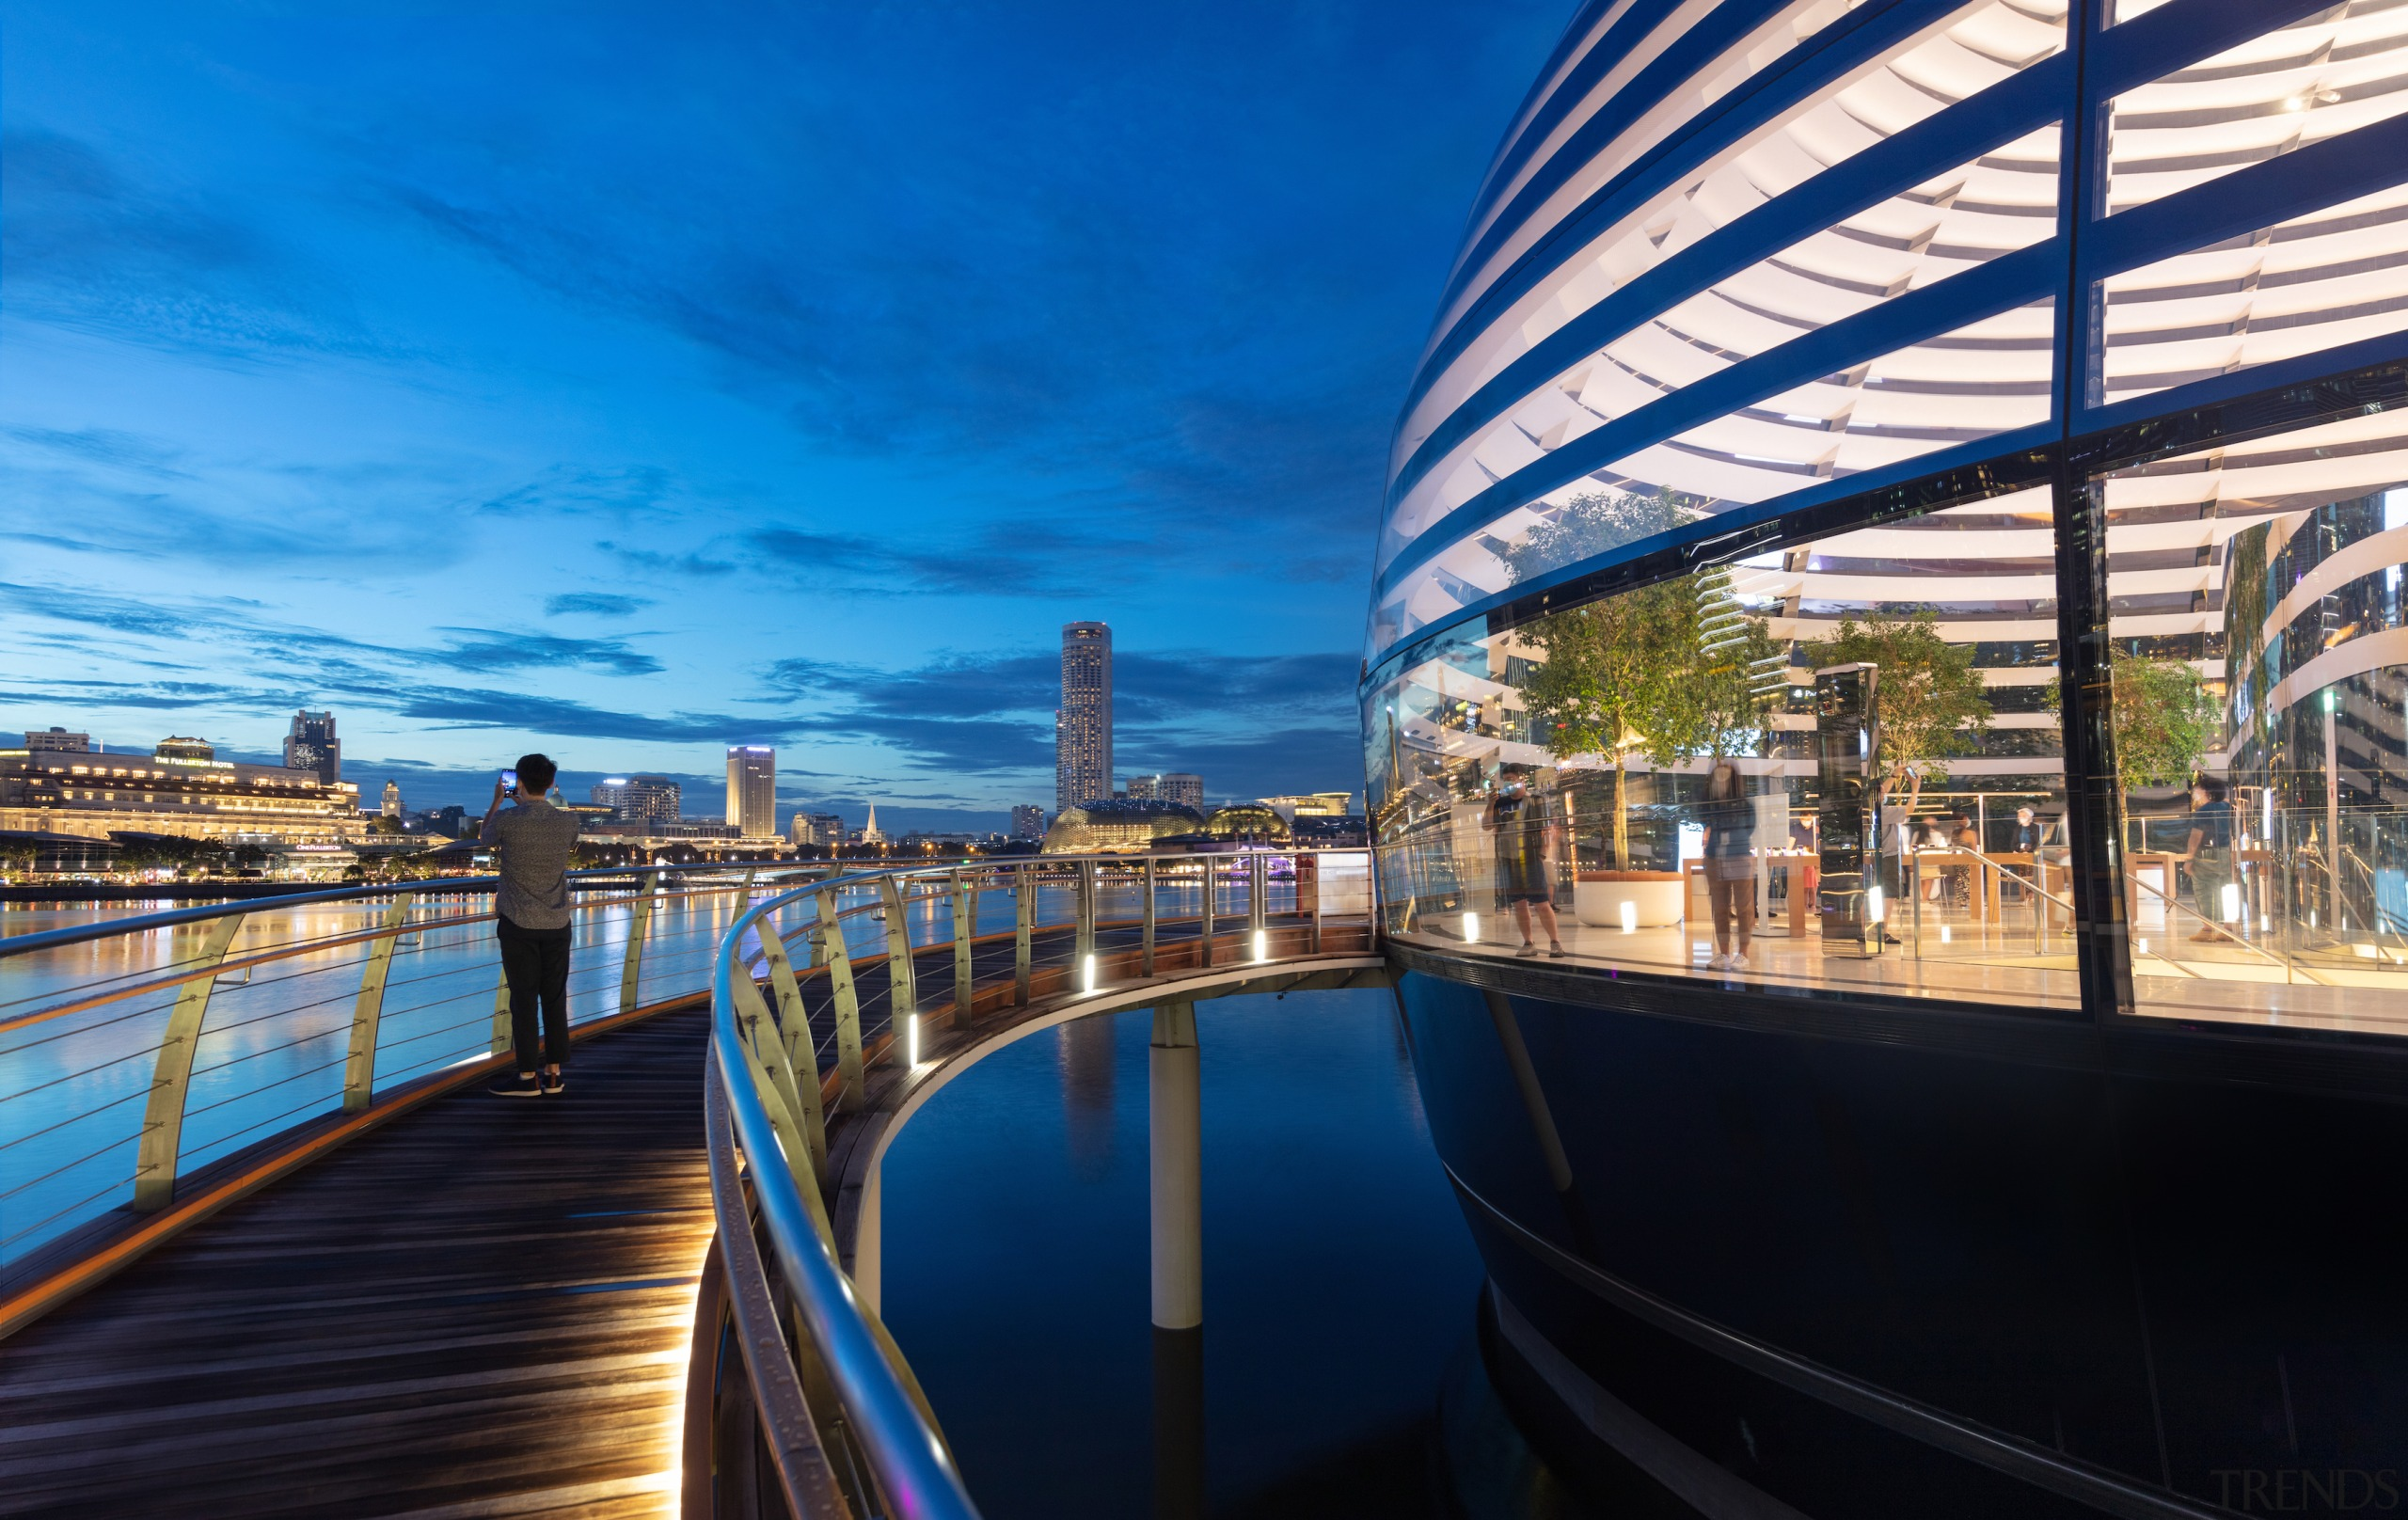 A lit walkway runs round the futuristic retail